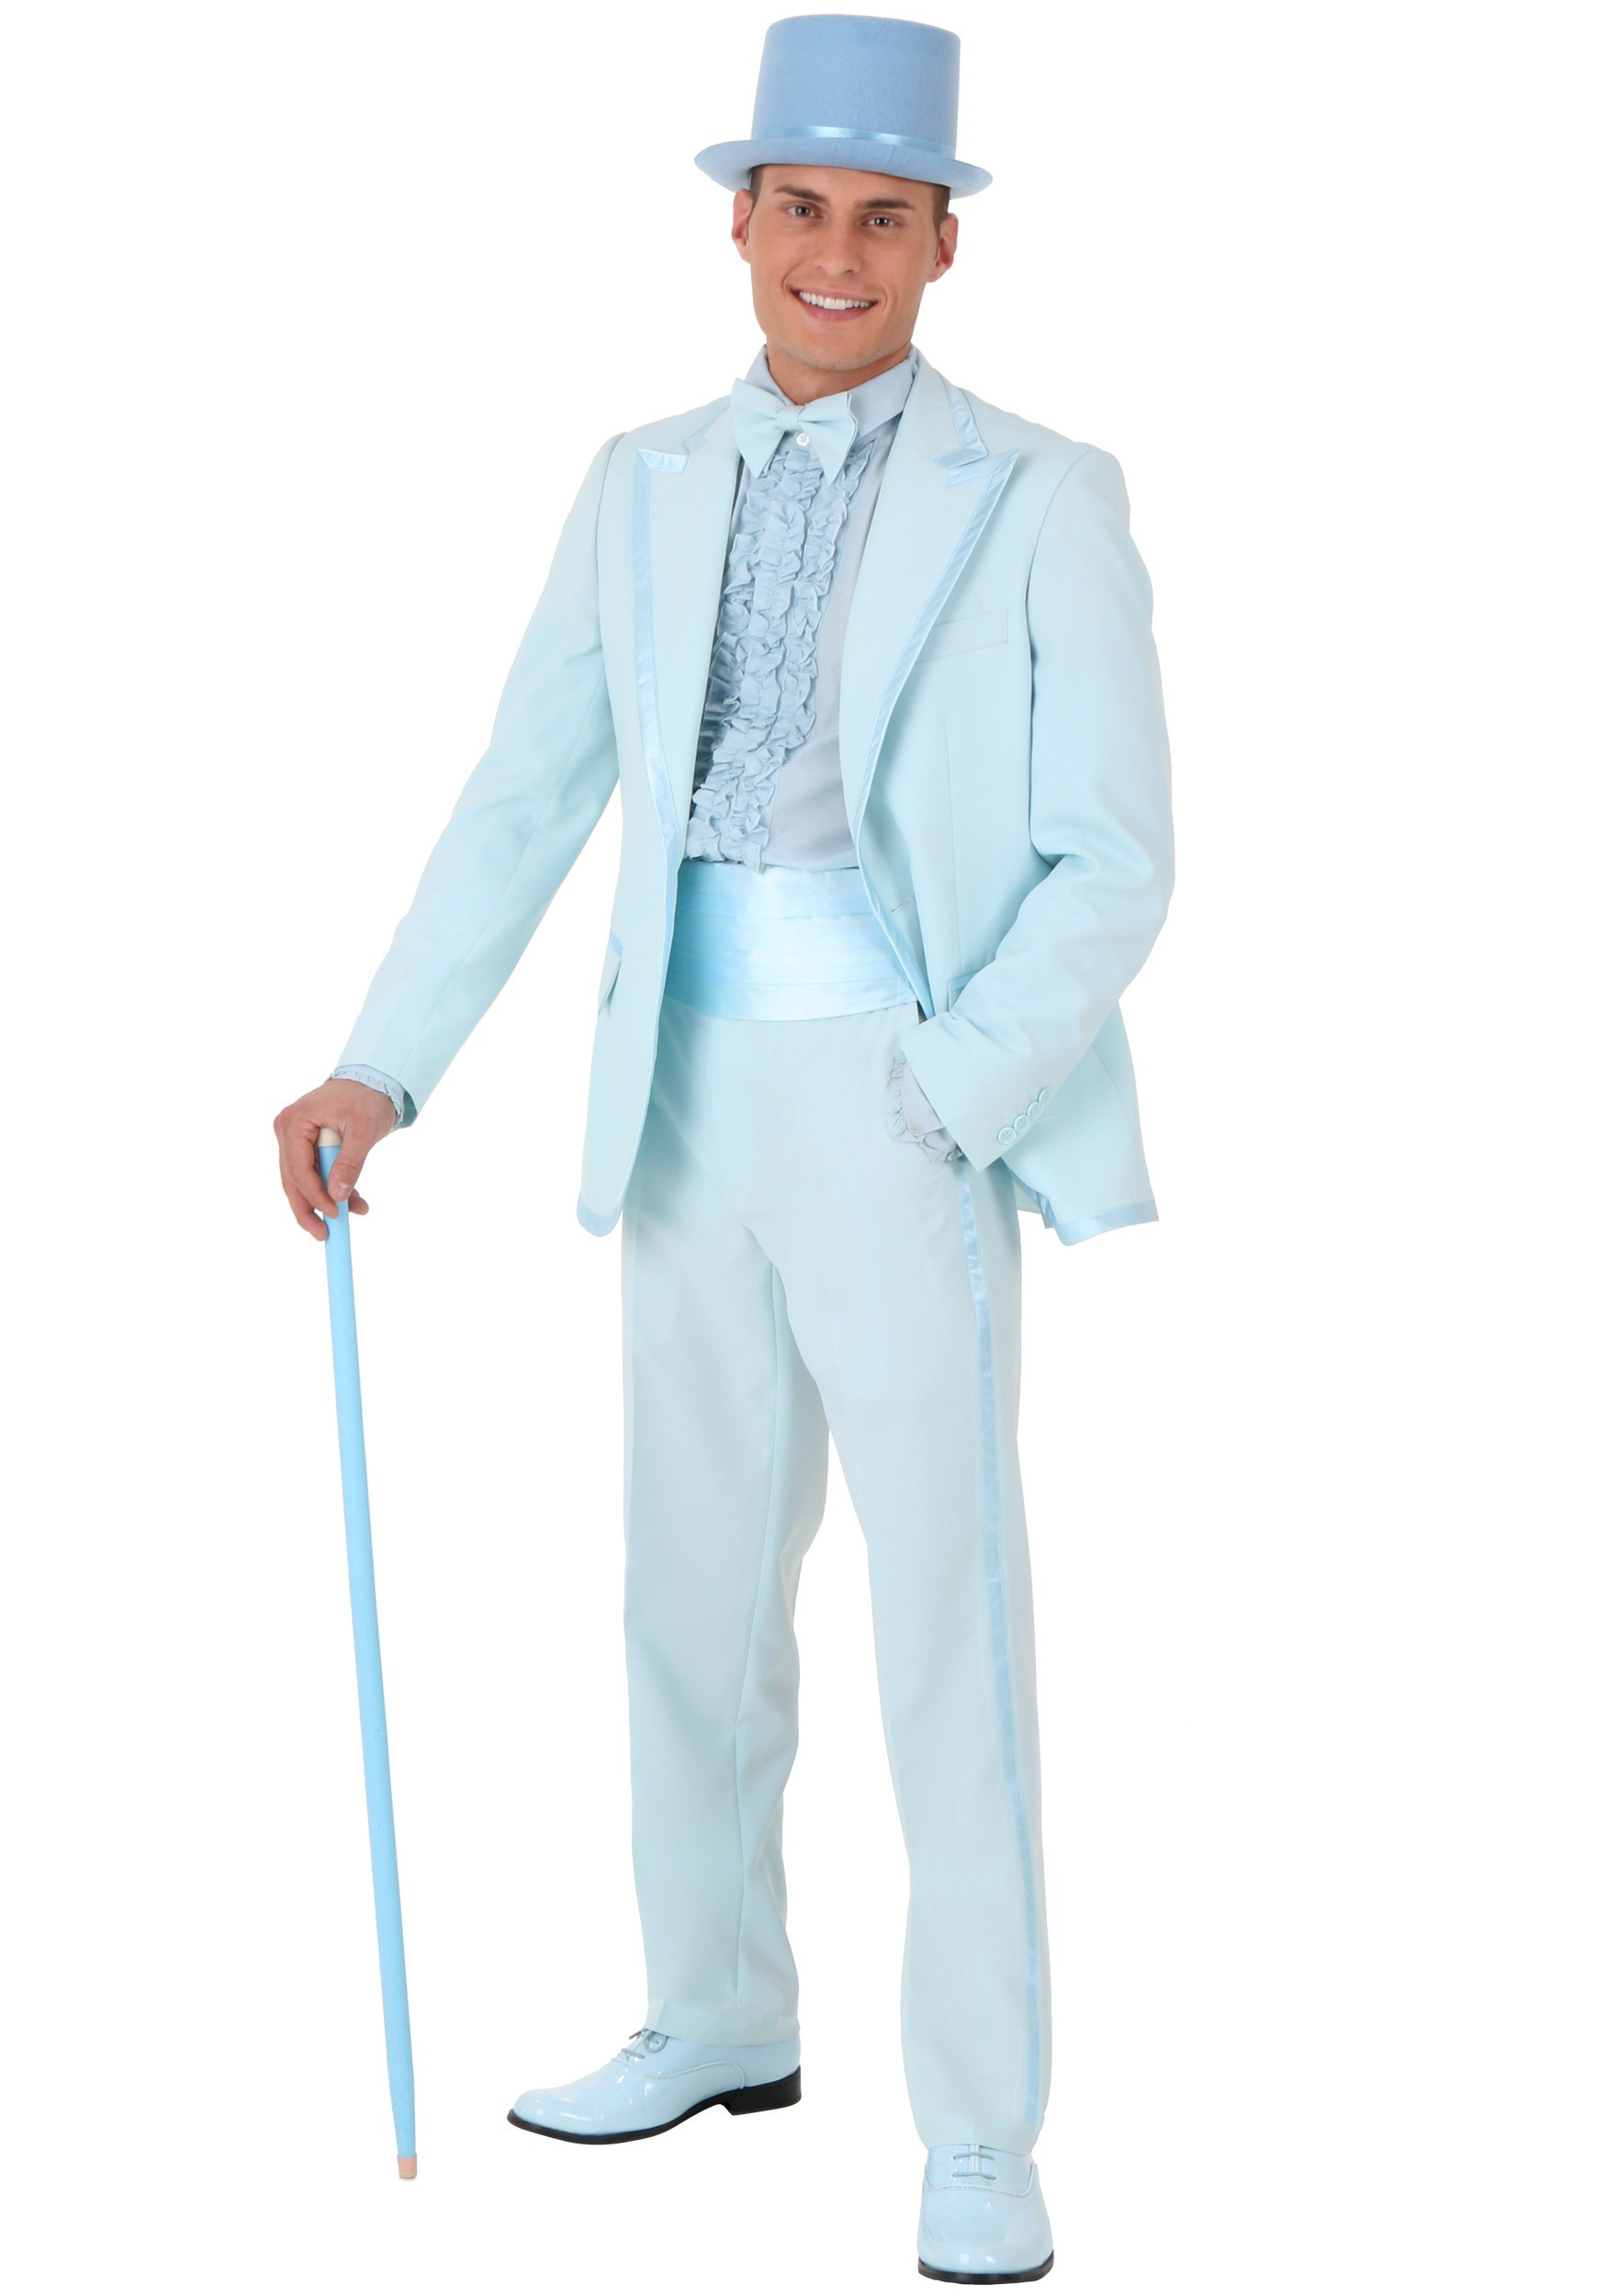 Dumb and Dumber Harry Tuxedo Costume